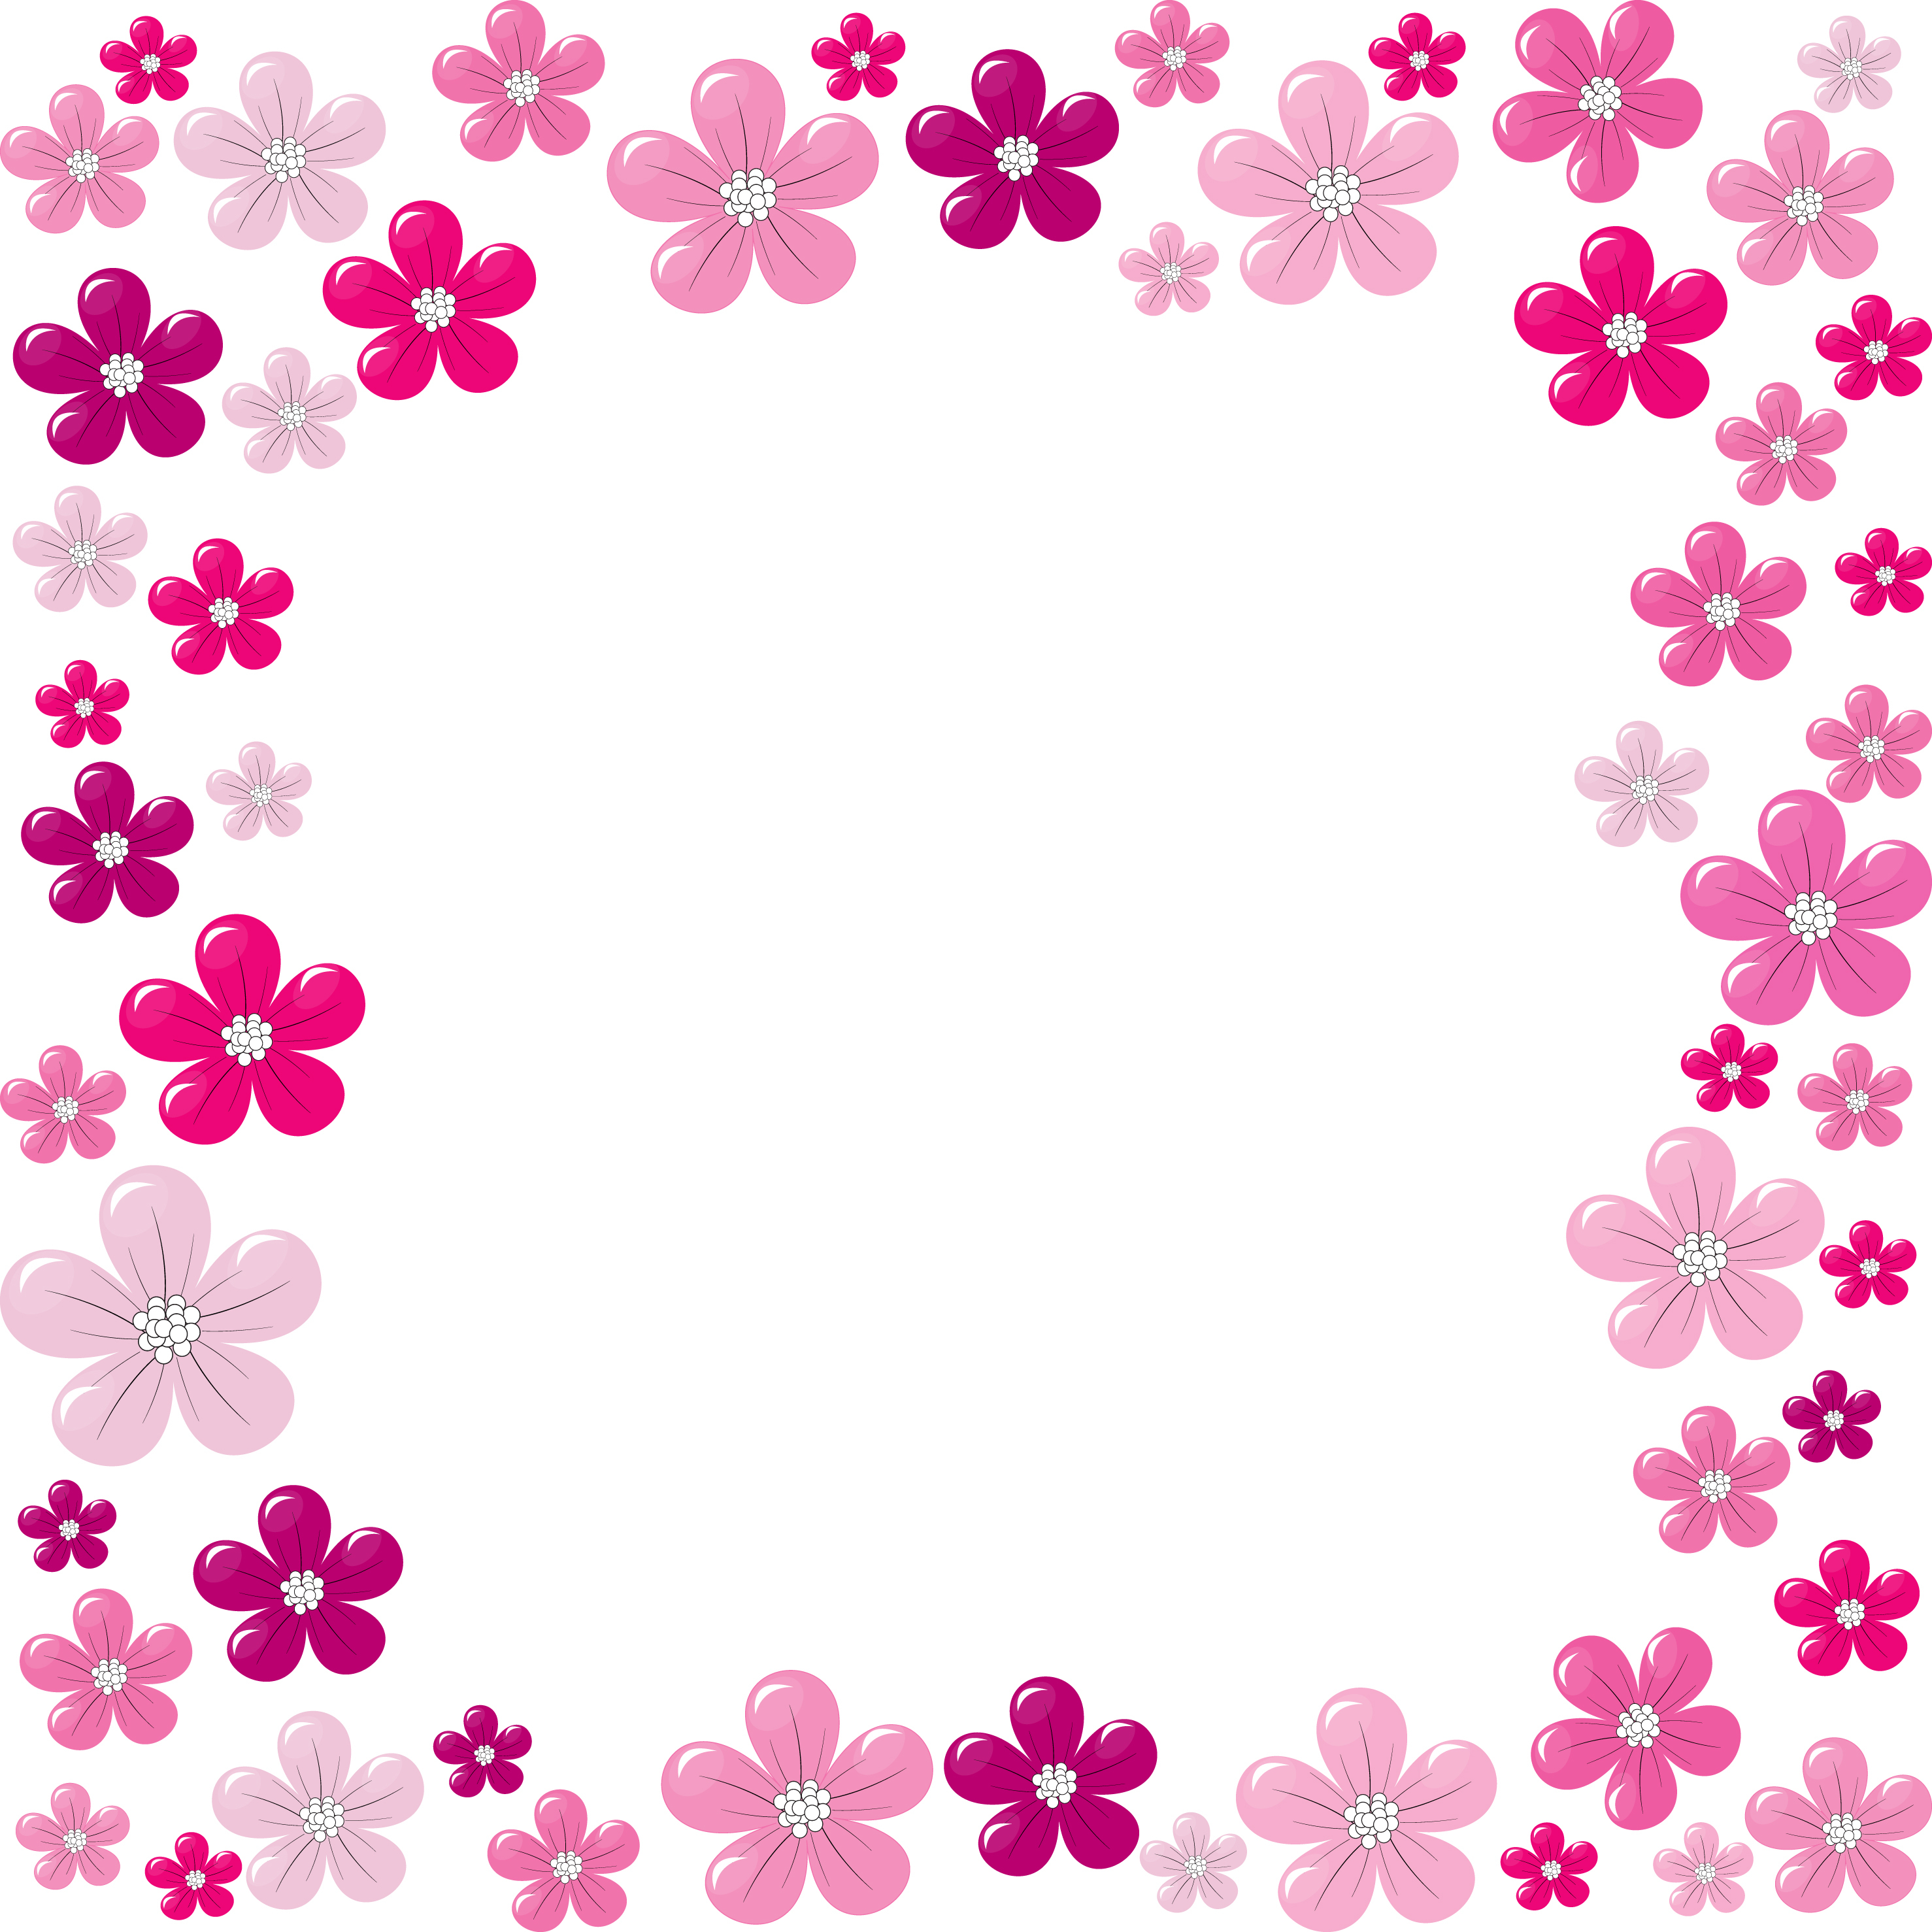 20 floral border vector images